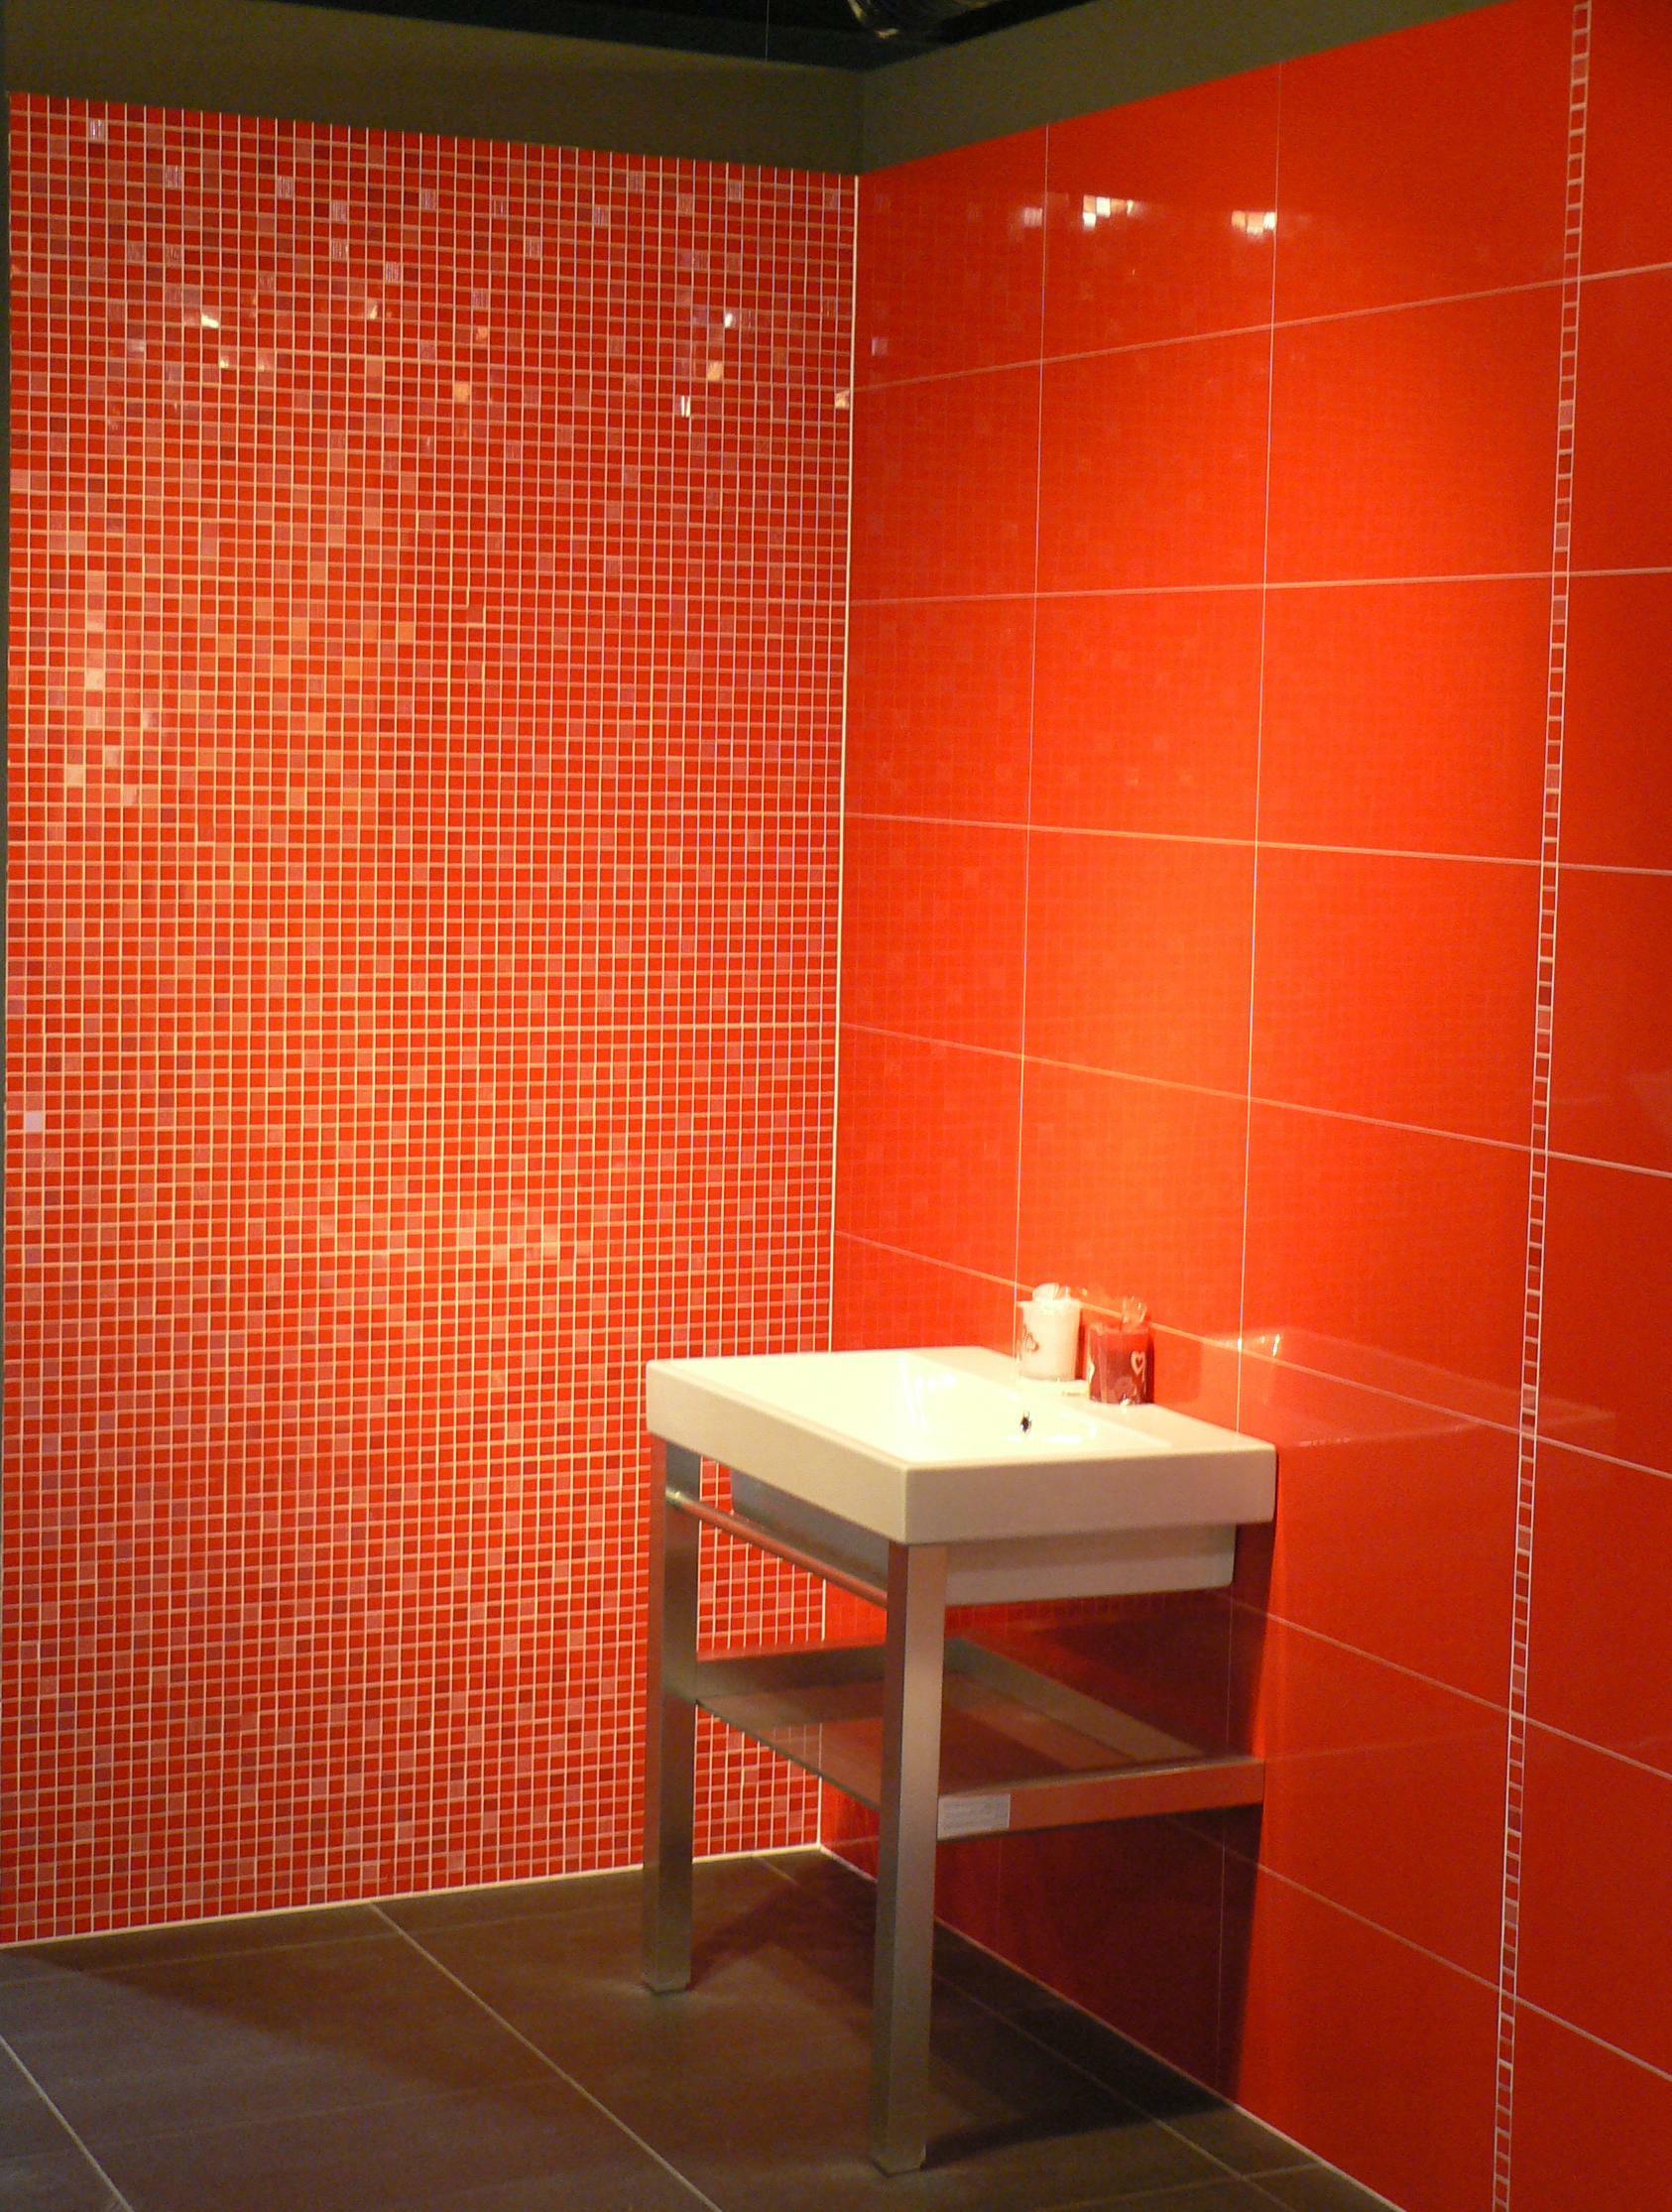 orangejuice - Fürdőszoba Titkok